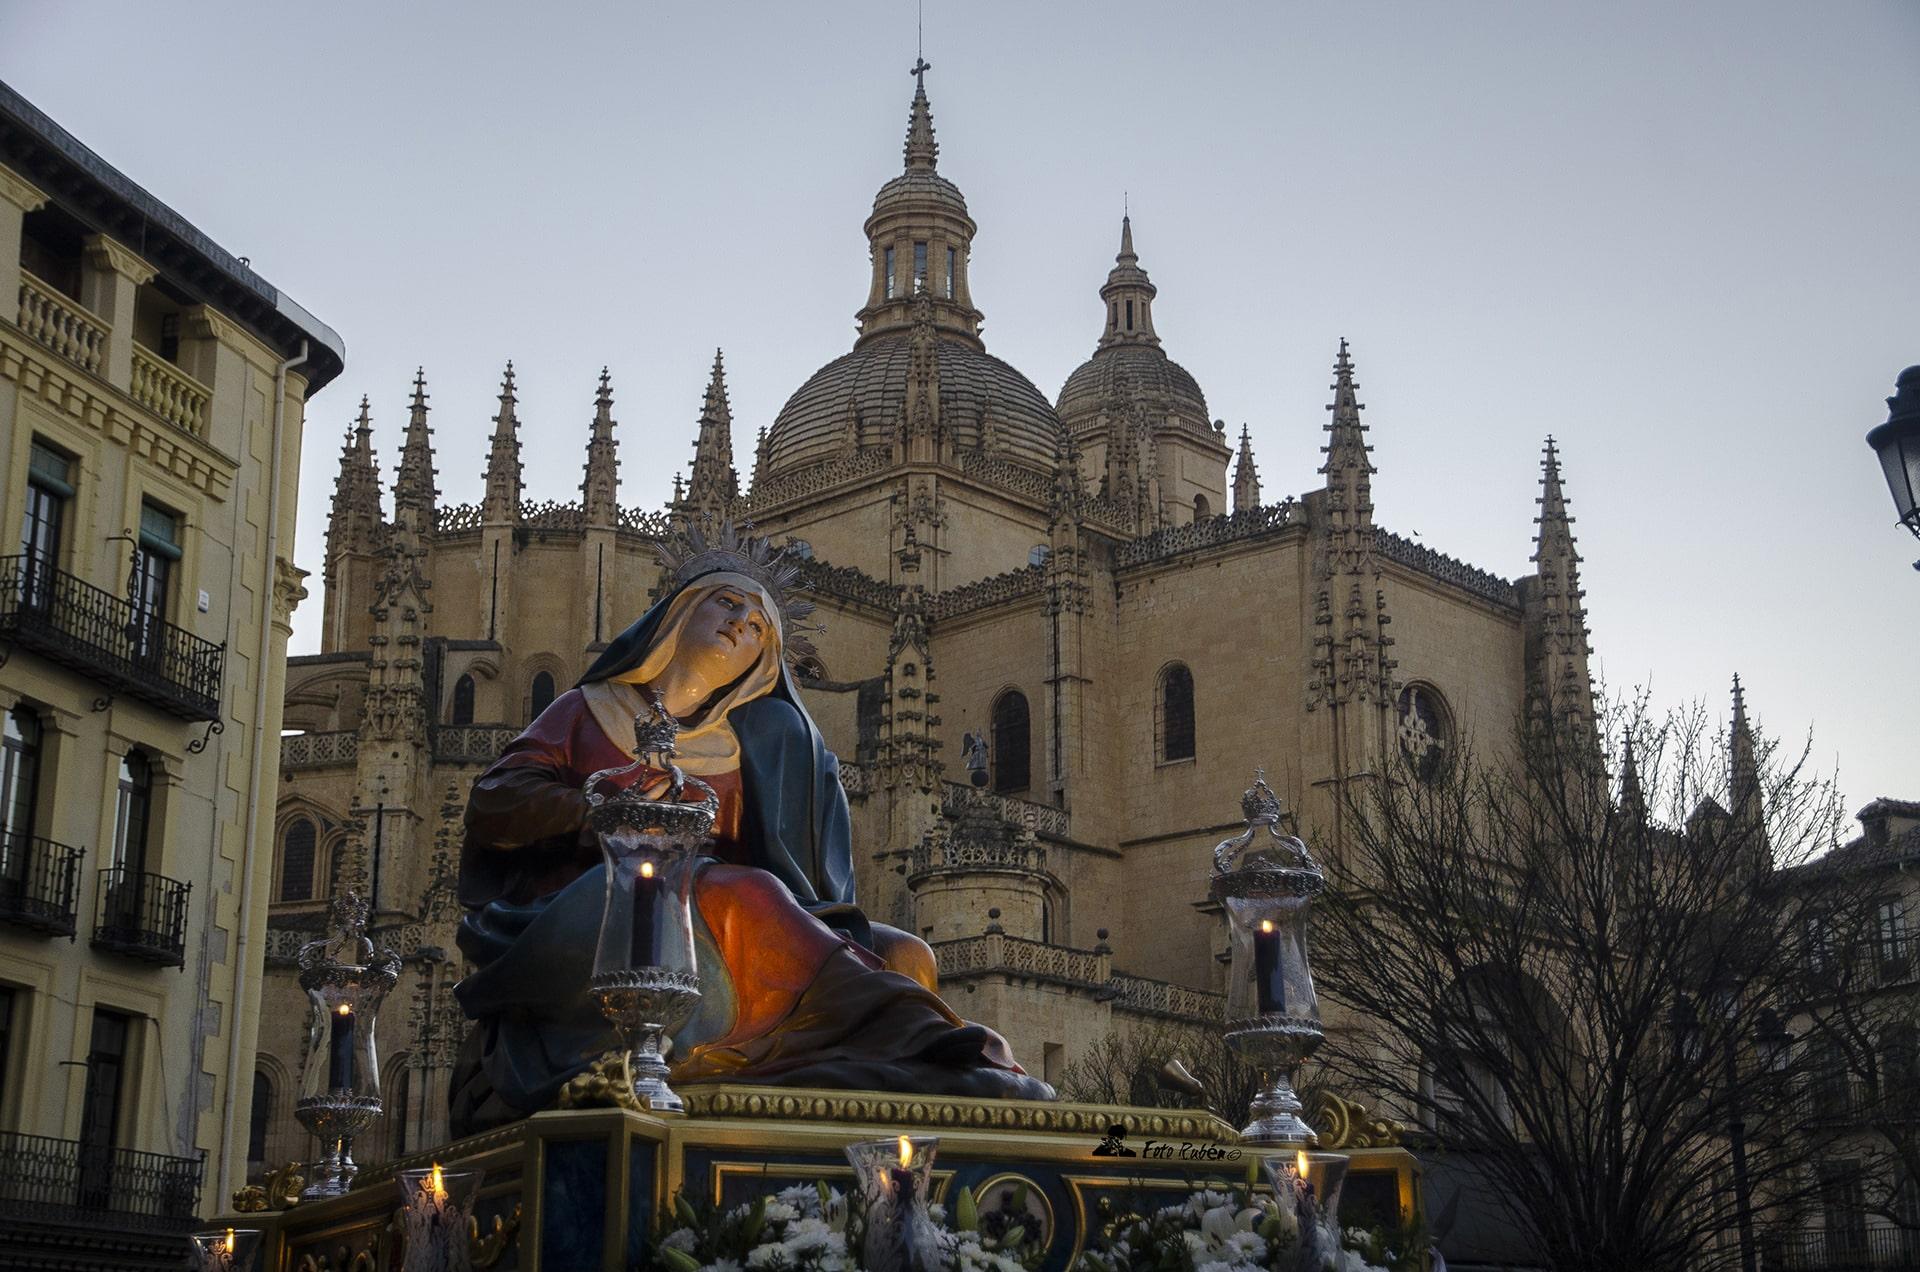 Procesion de Ntra. Madre Marçia Santismima de las Angustias, Segovia2